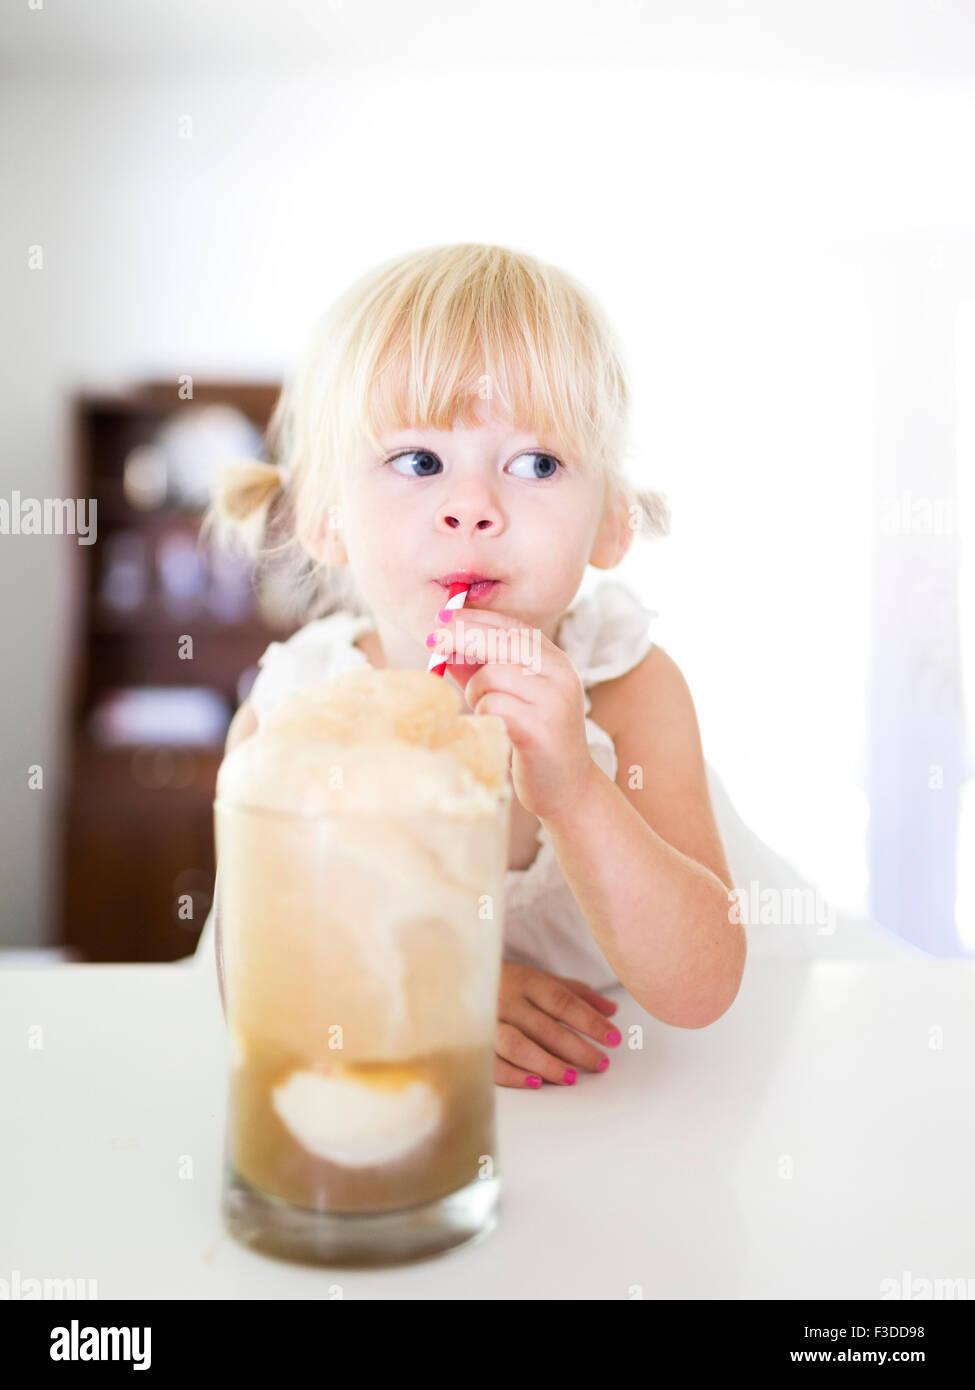 Girl (2-3) drinking milkshake - Stock Image